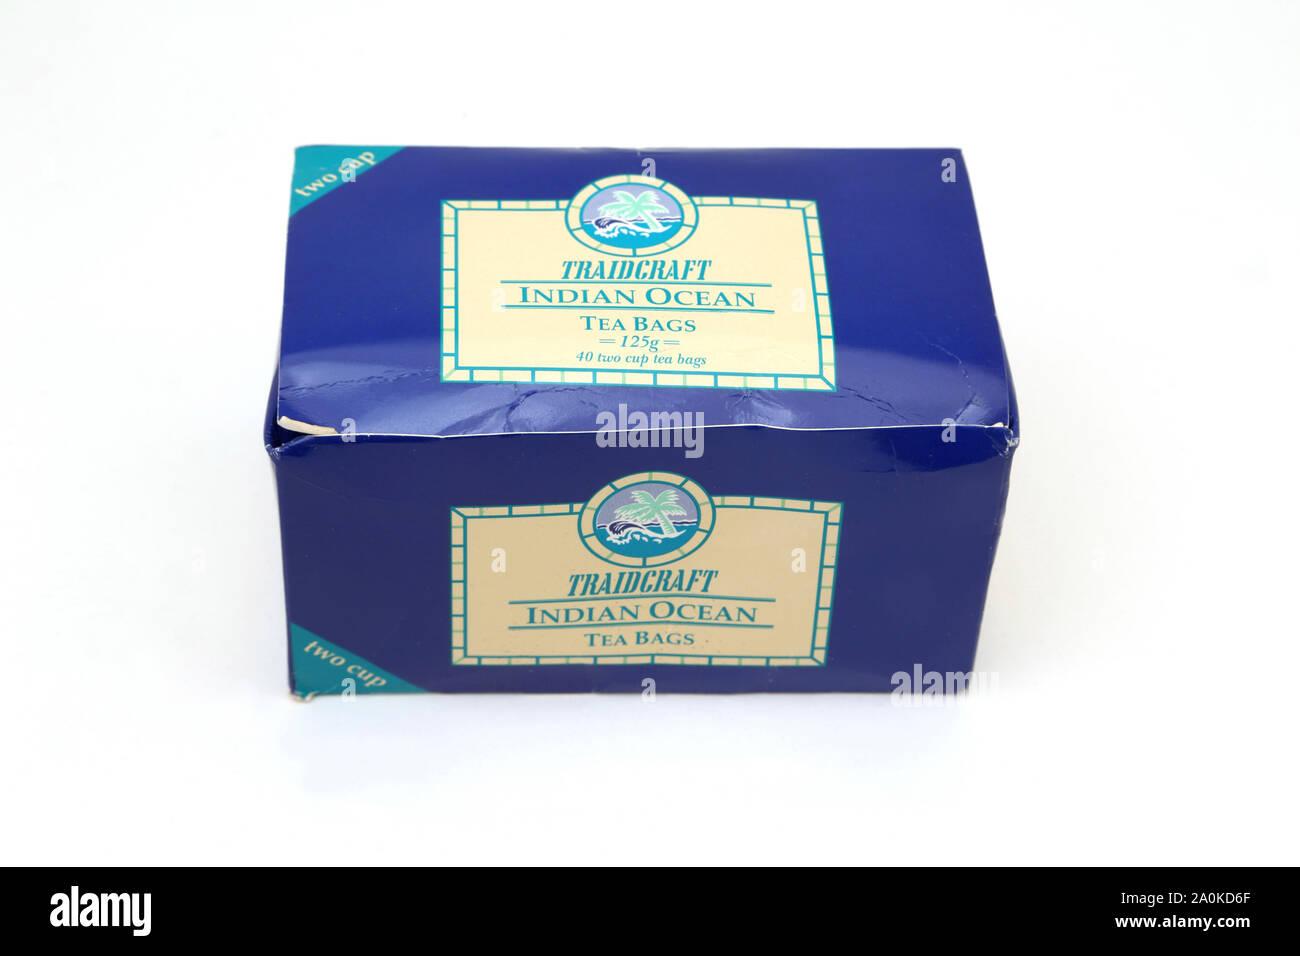 Caja de Traidcraft Océano Índico bolsas de té Foto de stock